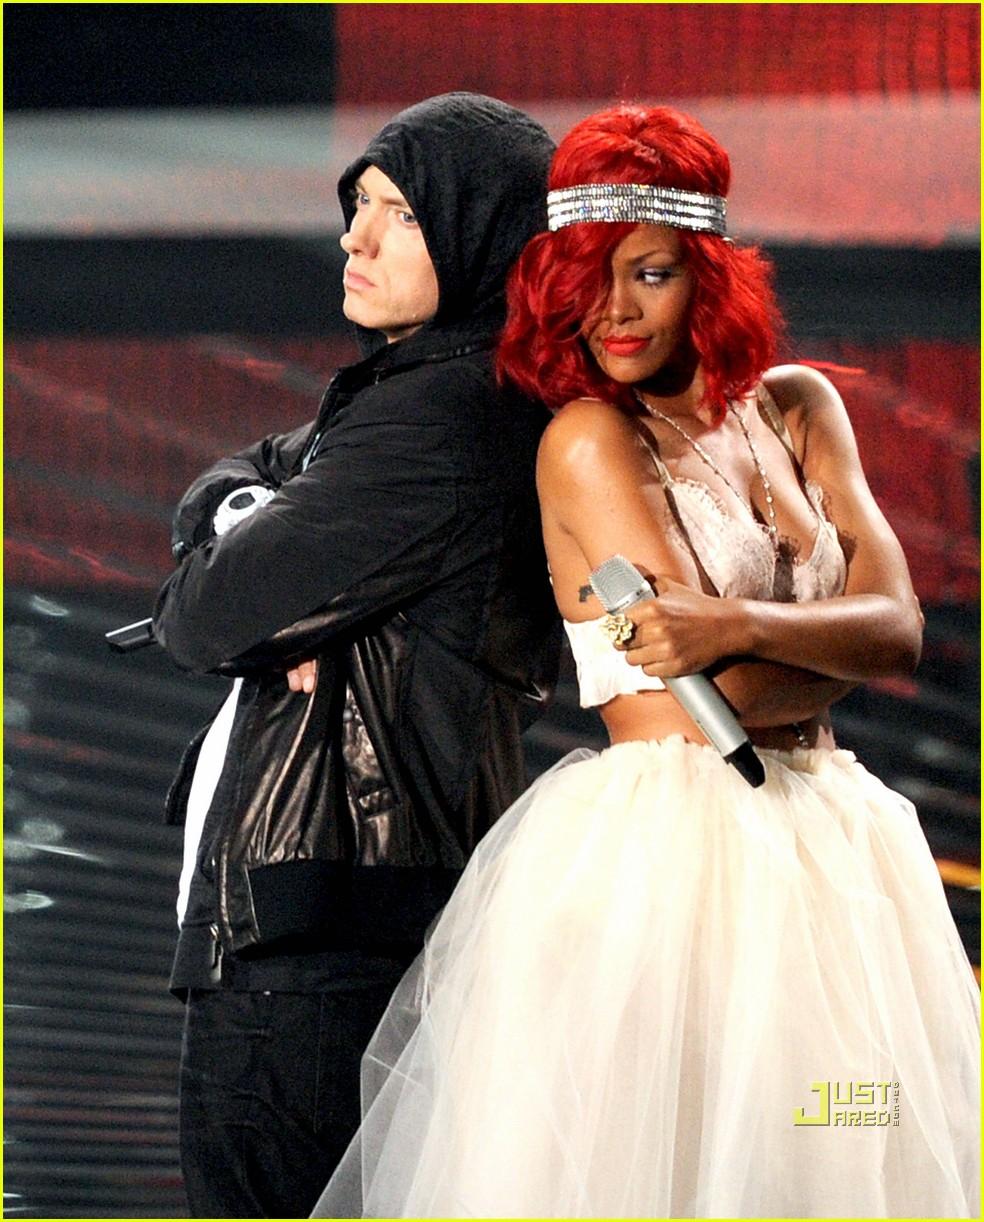 Rihanna, Eminem, Love The Way You LIe